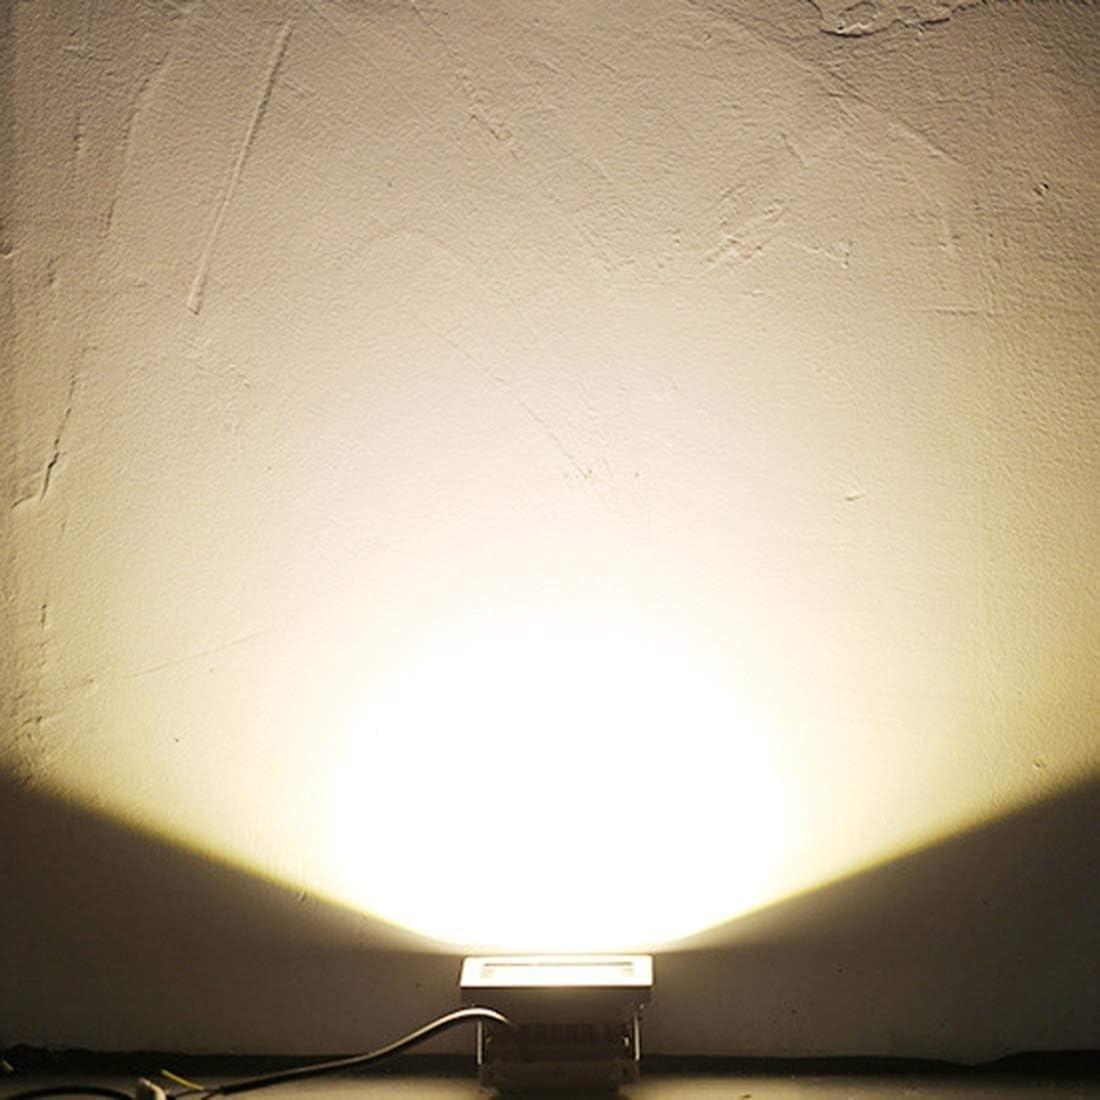 Yfymk 50W 6000LM Life Waterproof 50 LED SMD-3528 Floodlight Lamp 27.422.94.3cm Color : White Light AC 85-265V Size